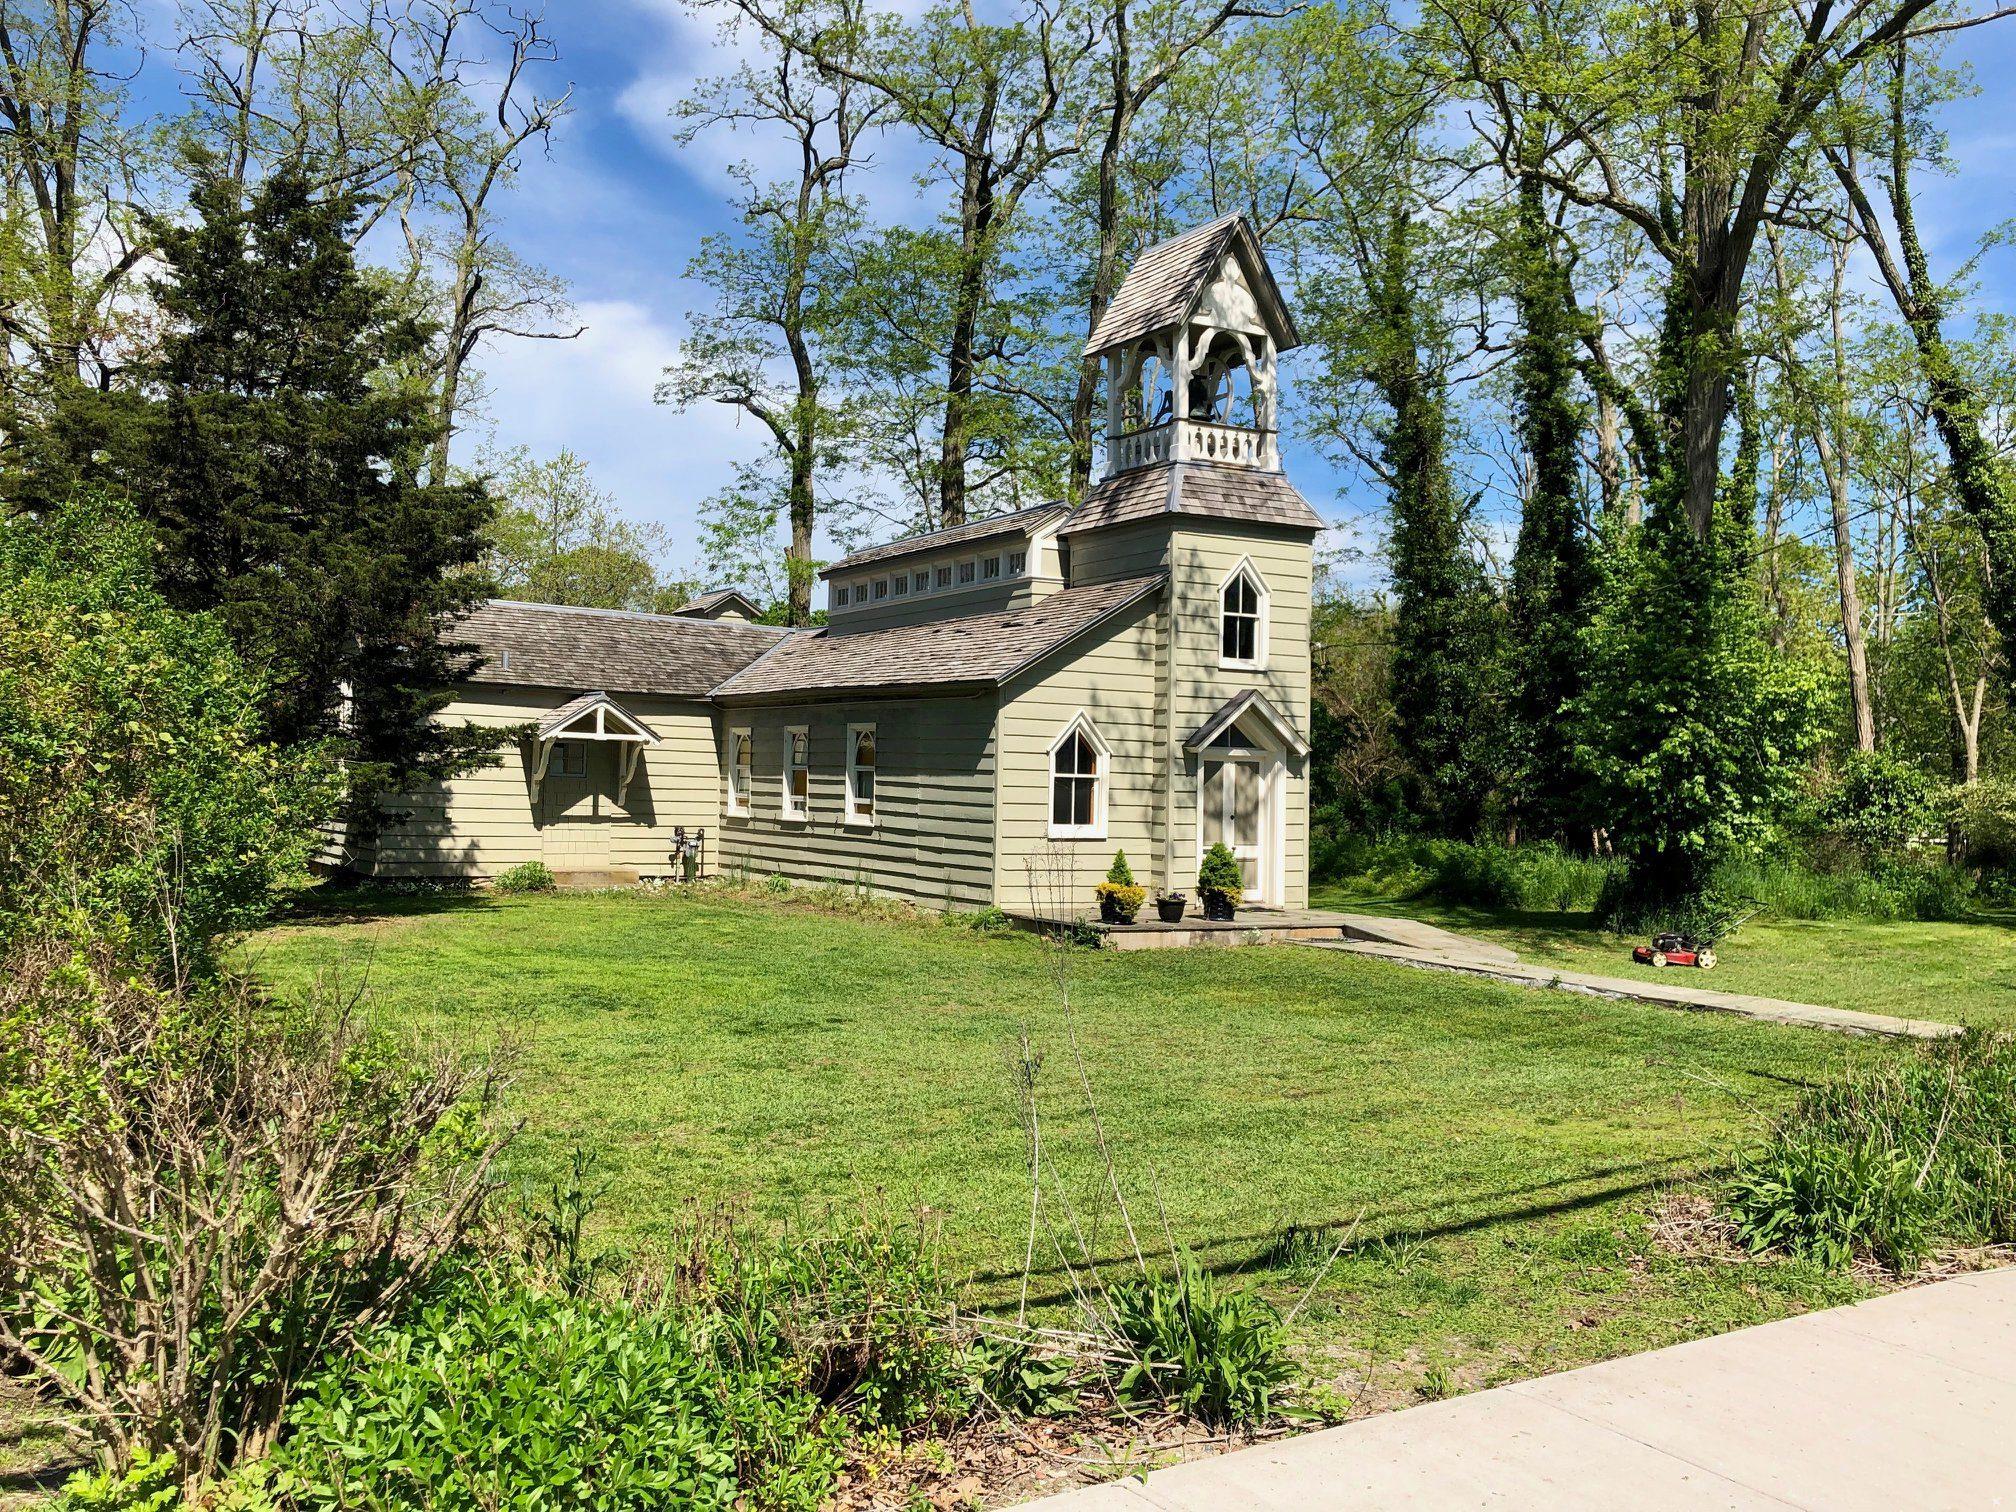 Meeting House & Bird Homestead, Rye -